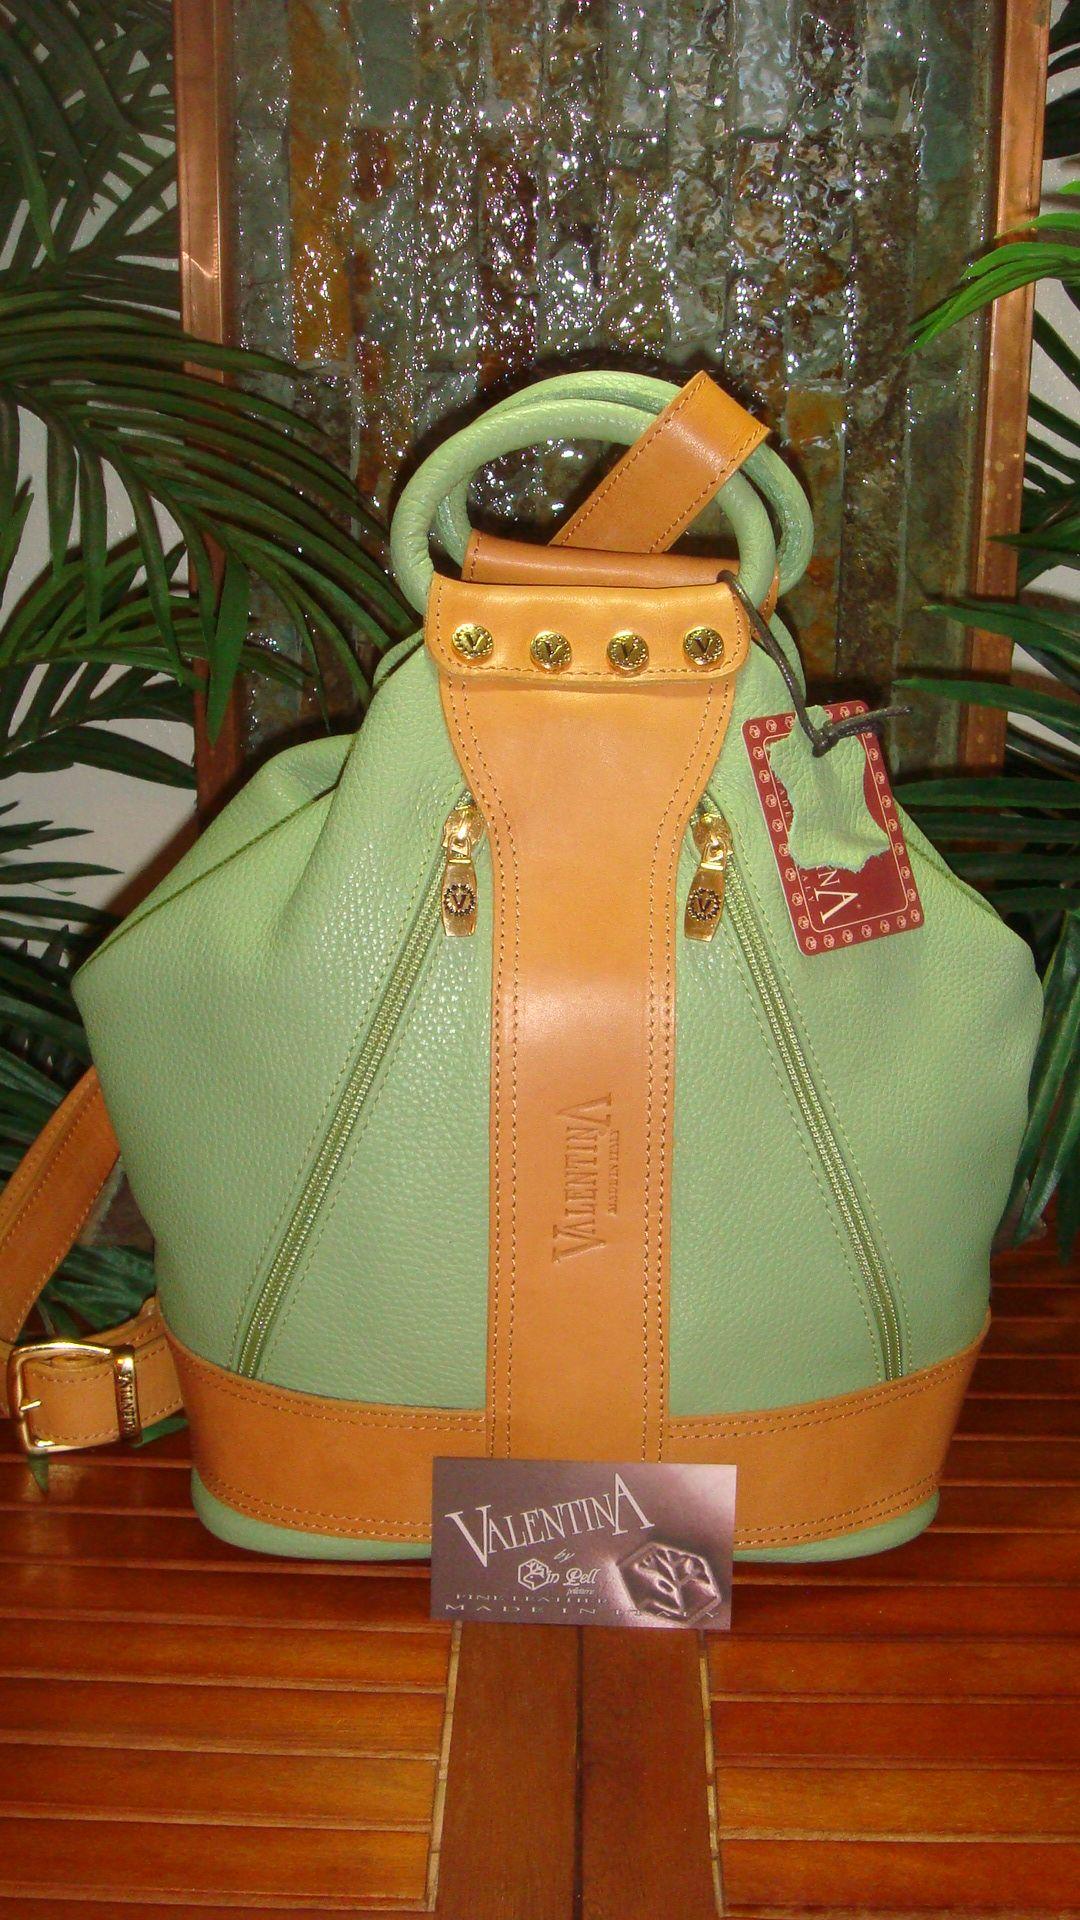 Valentina Handbags Style 901